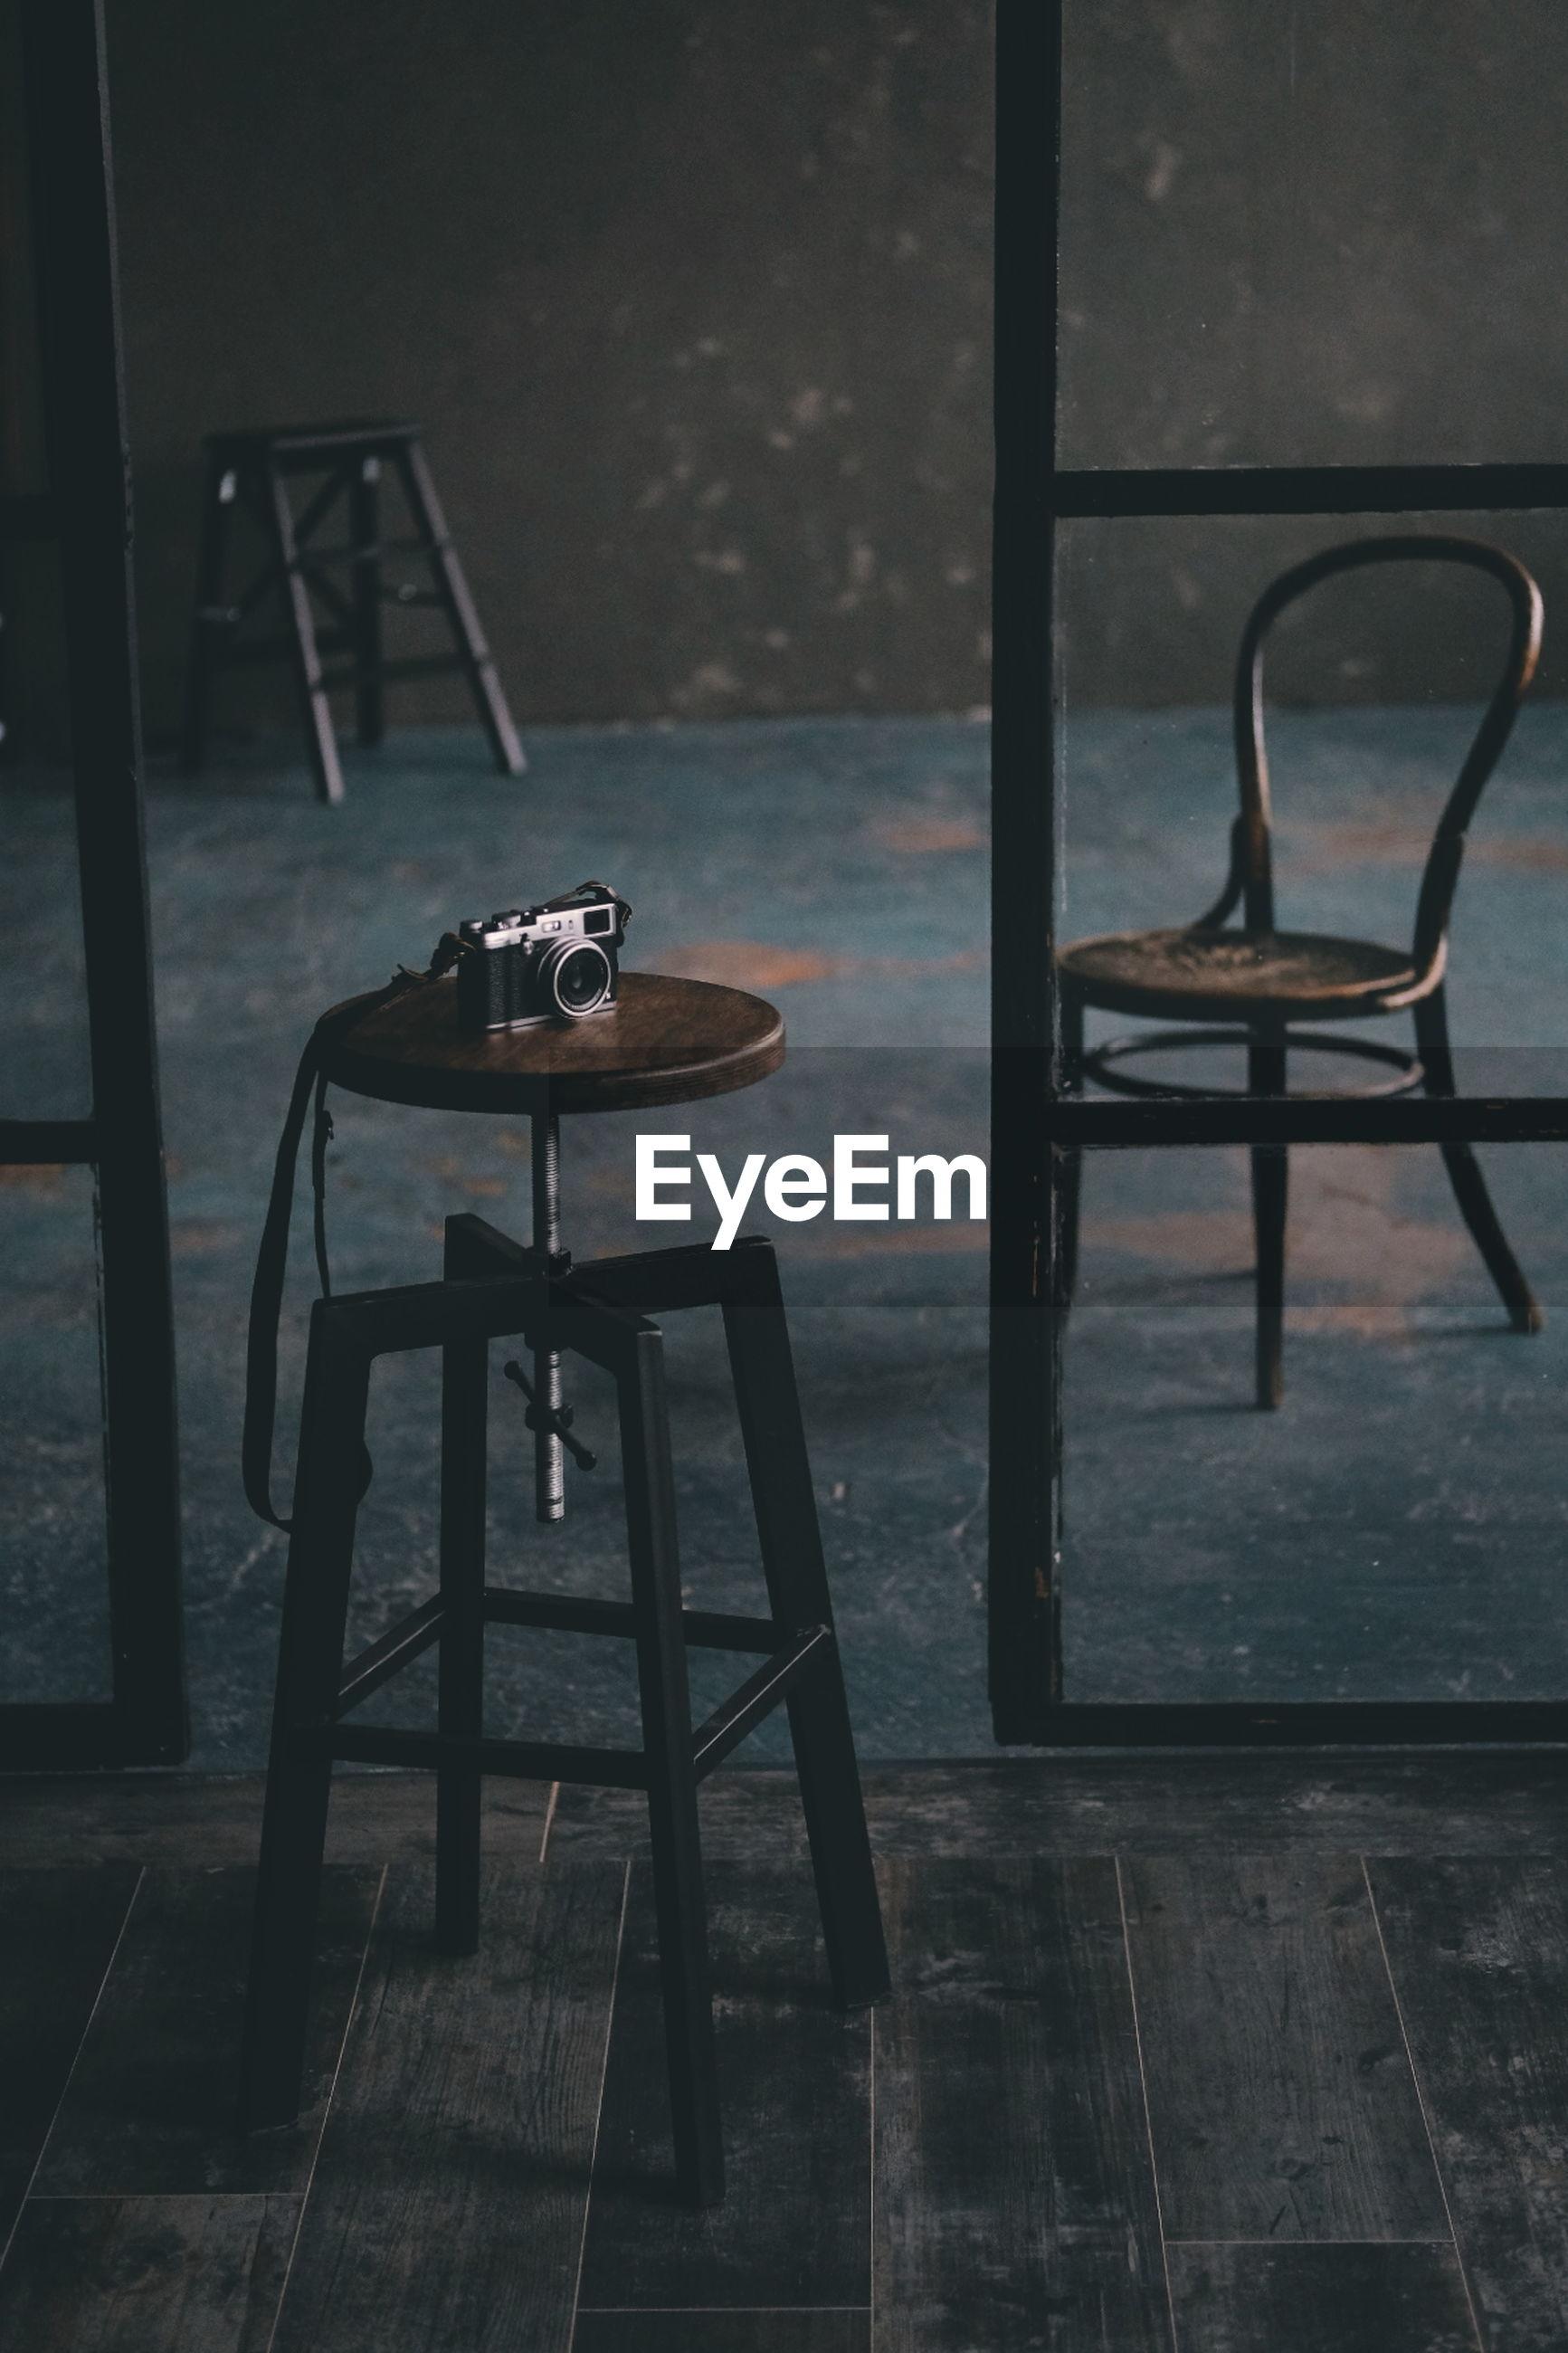 Camera on stool